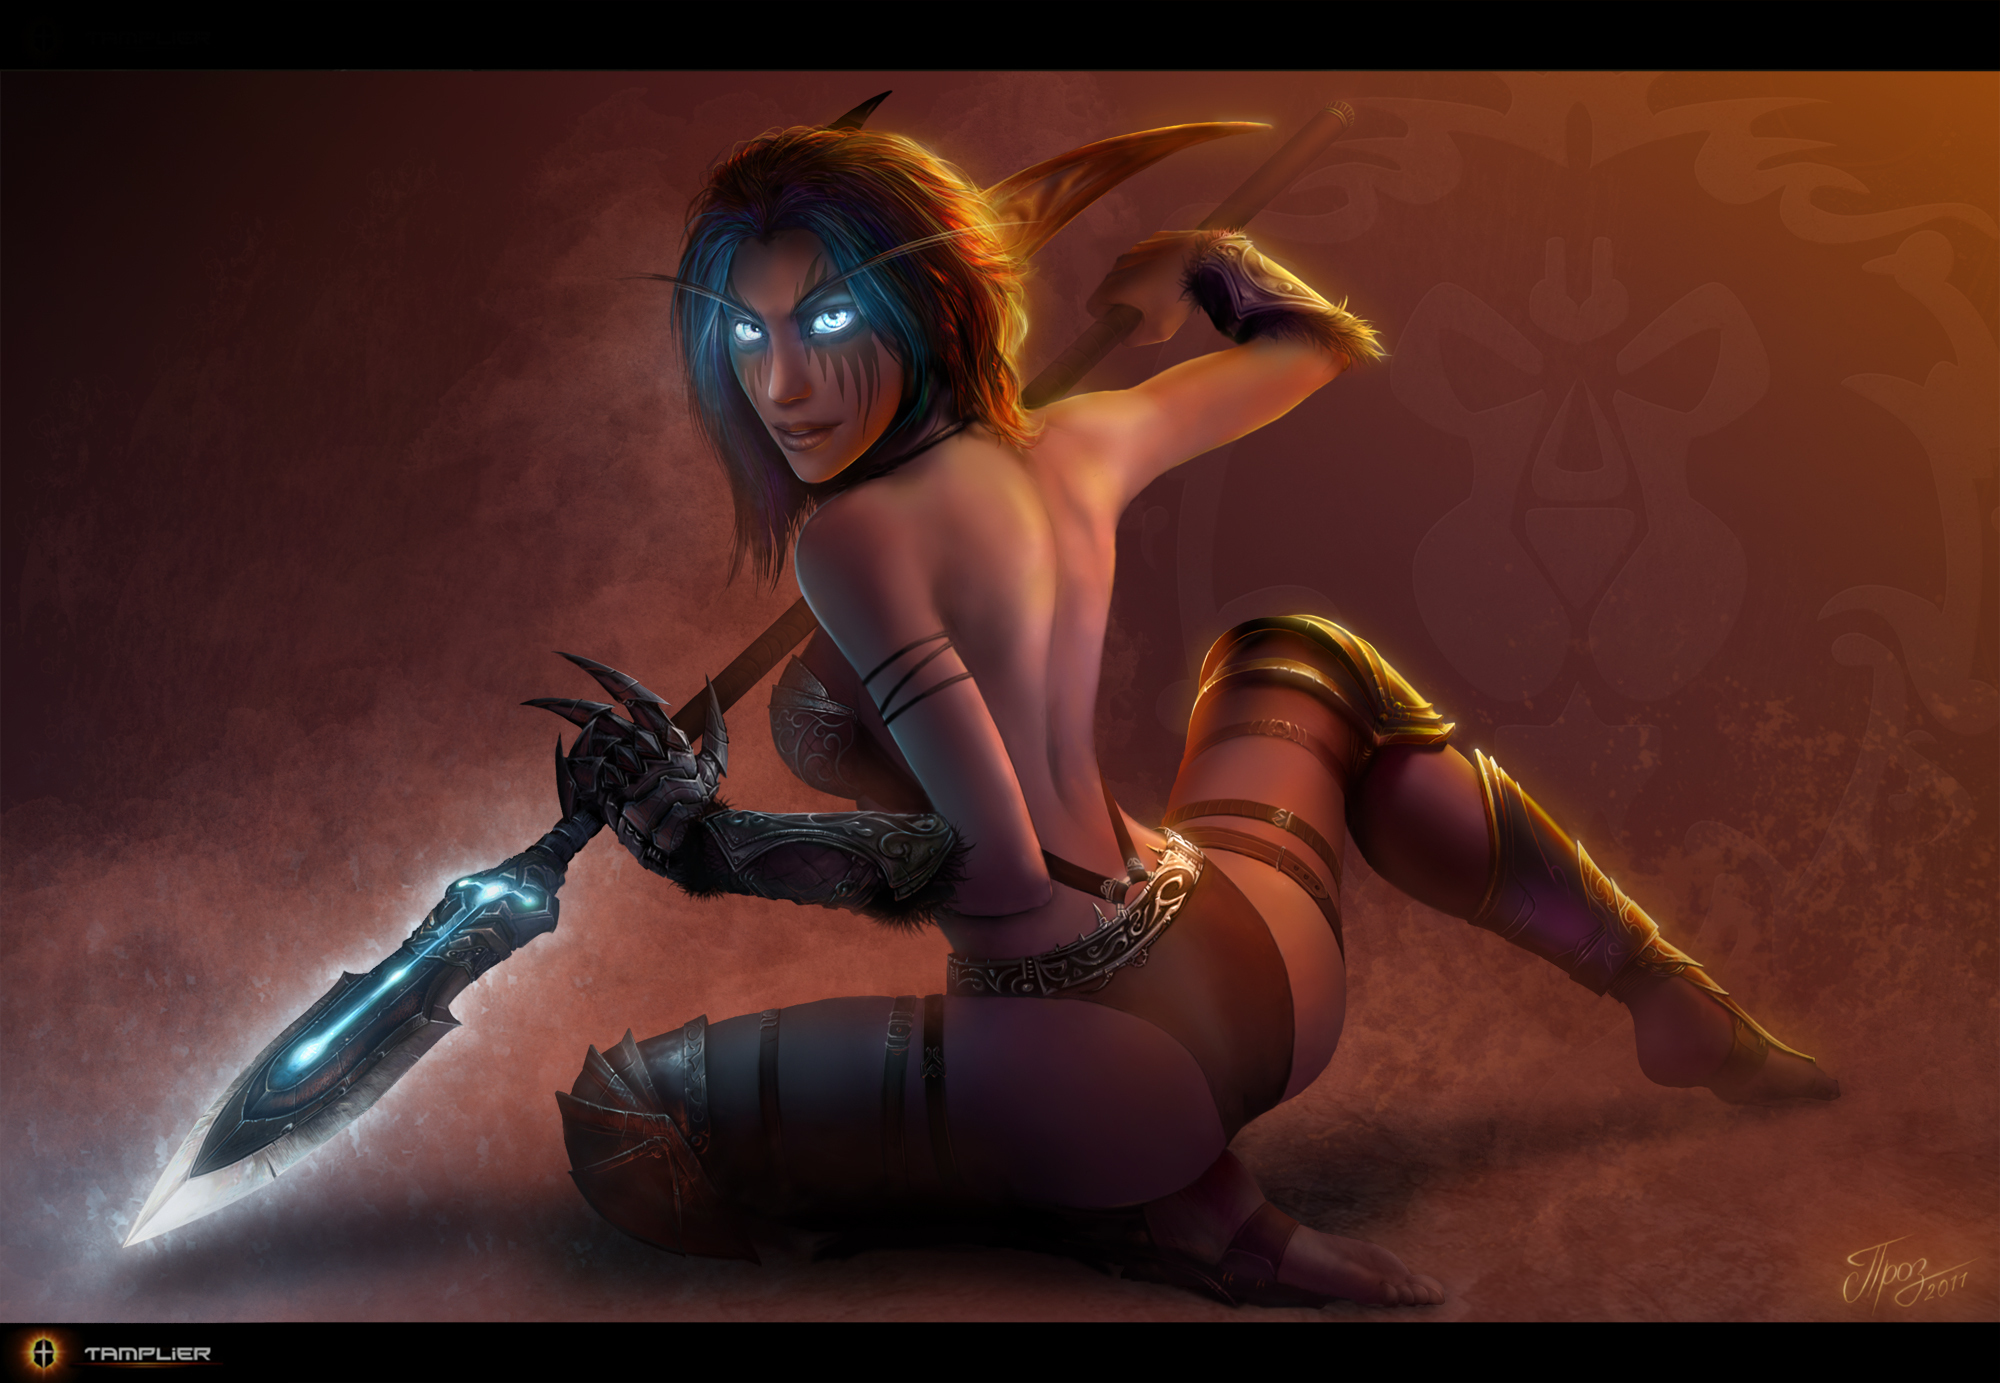 world-of-warcraft-hot-girl